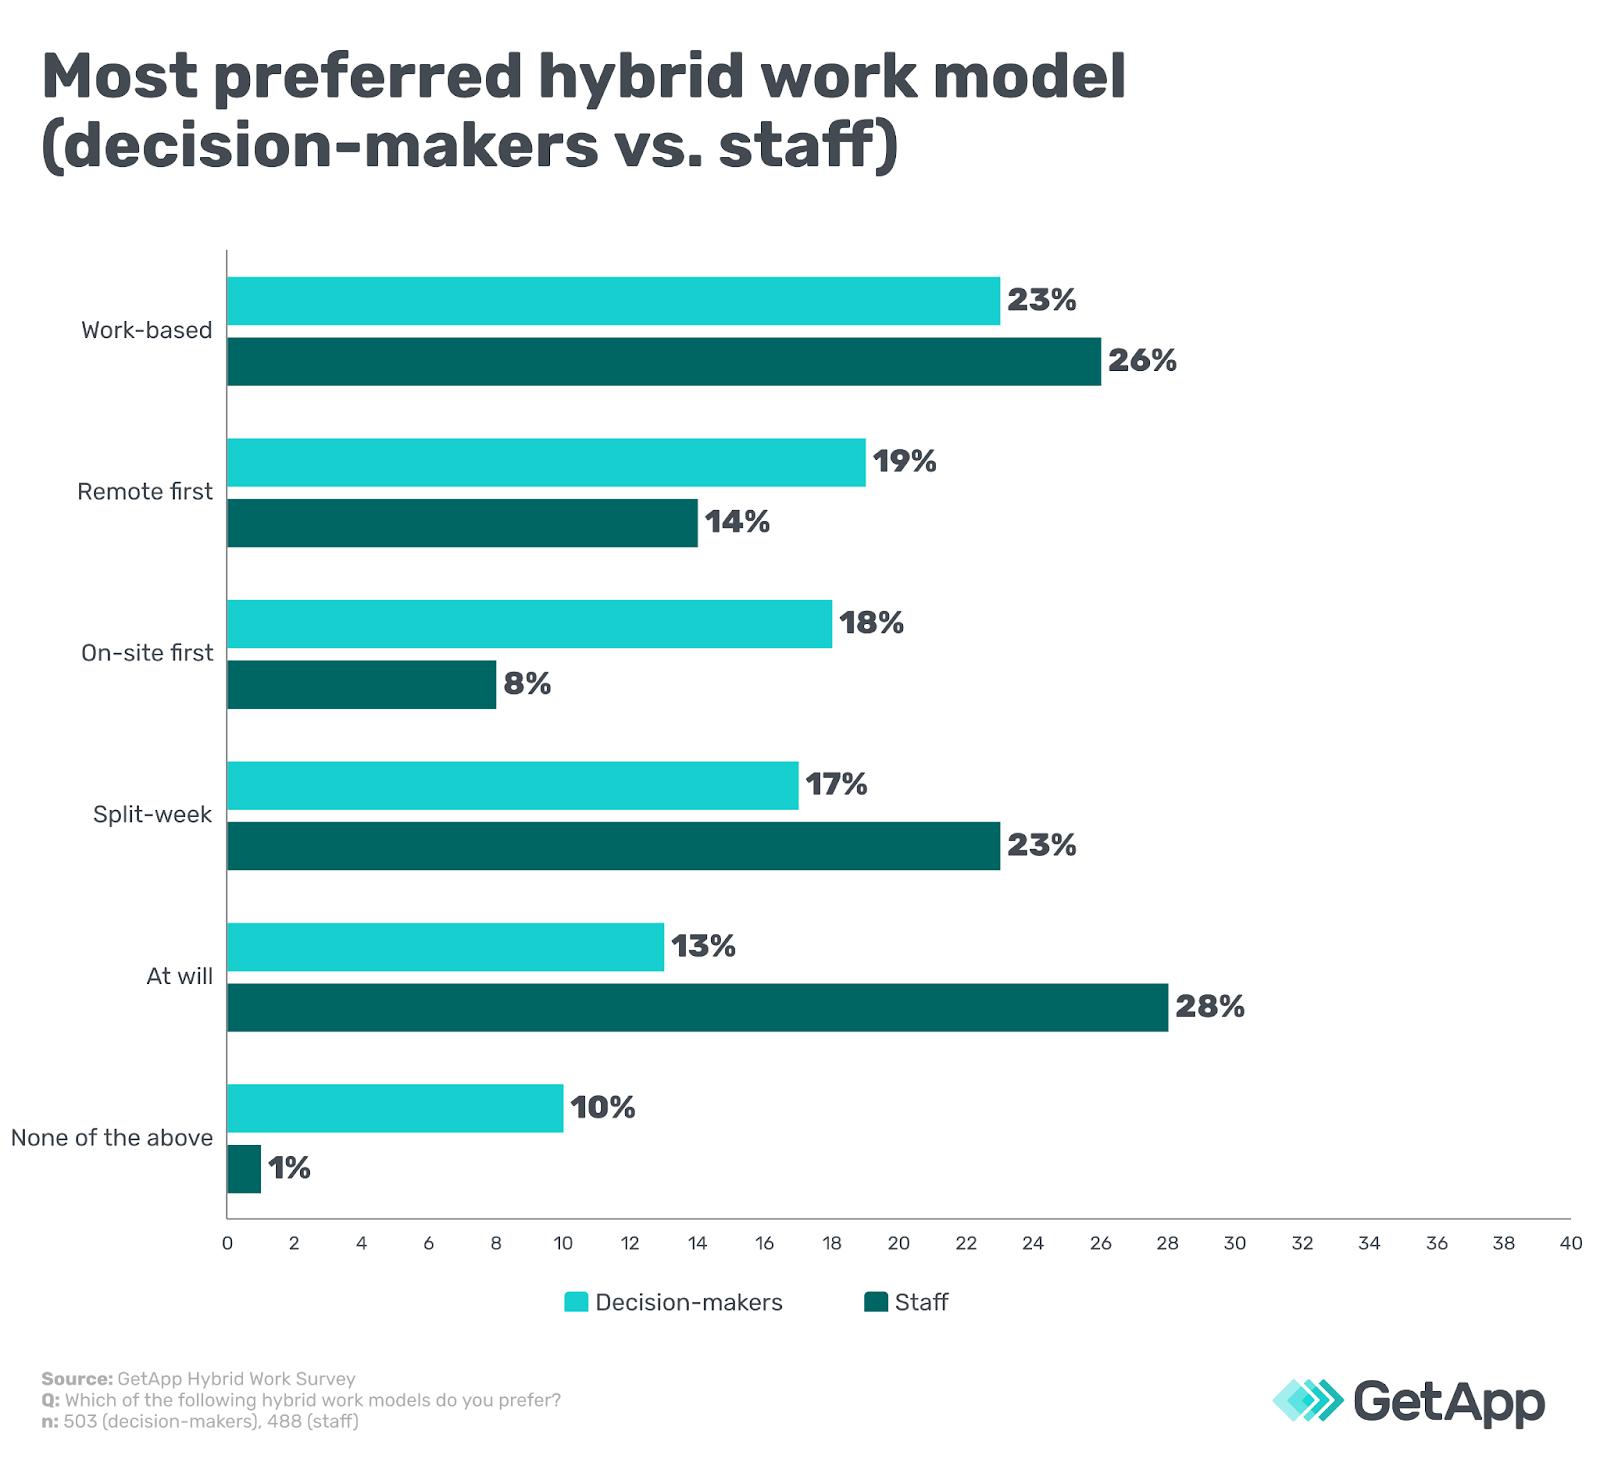 Most preferred hybrid work model (decision-makers vs. staff)